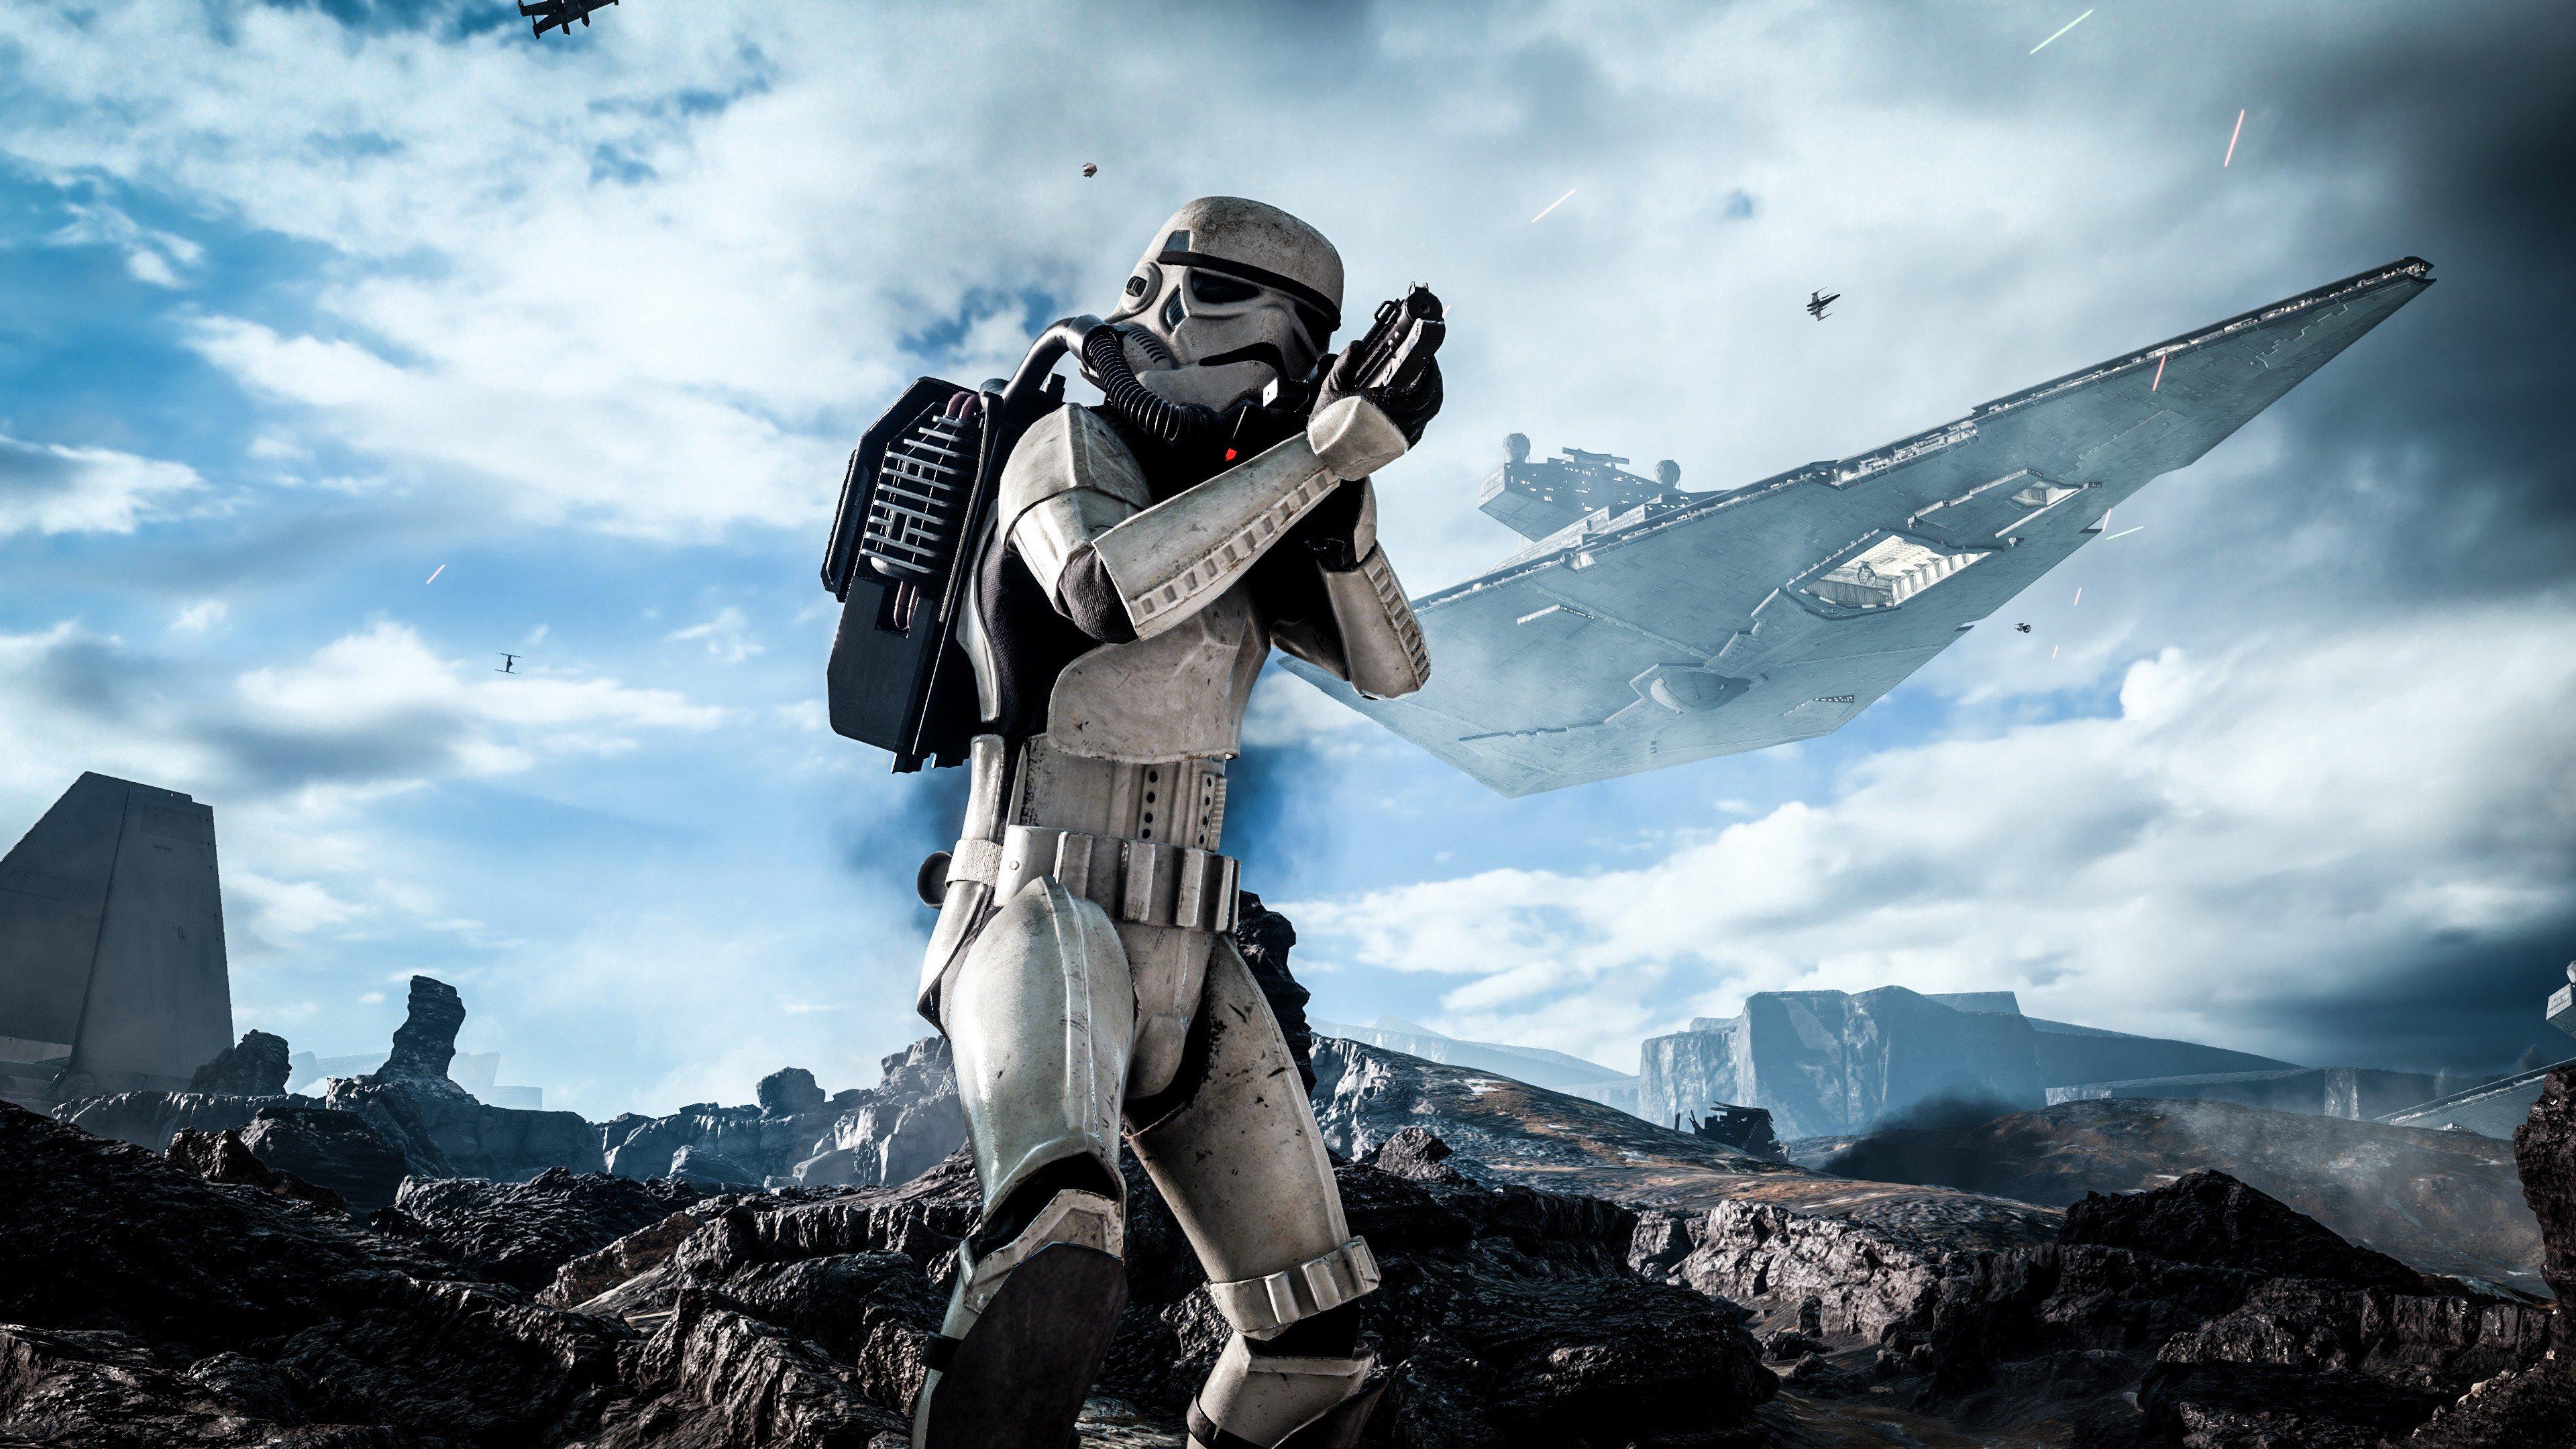 Star Wars Ultrawide Wallpaper: Stormtrooper In Star Wars, HD Movies, 4k Wallpapers